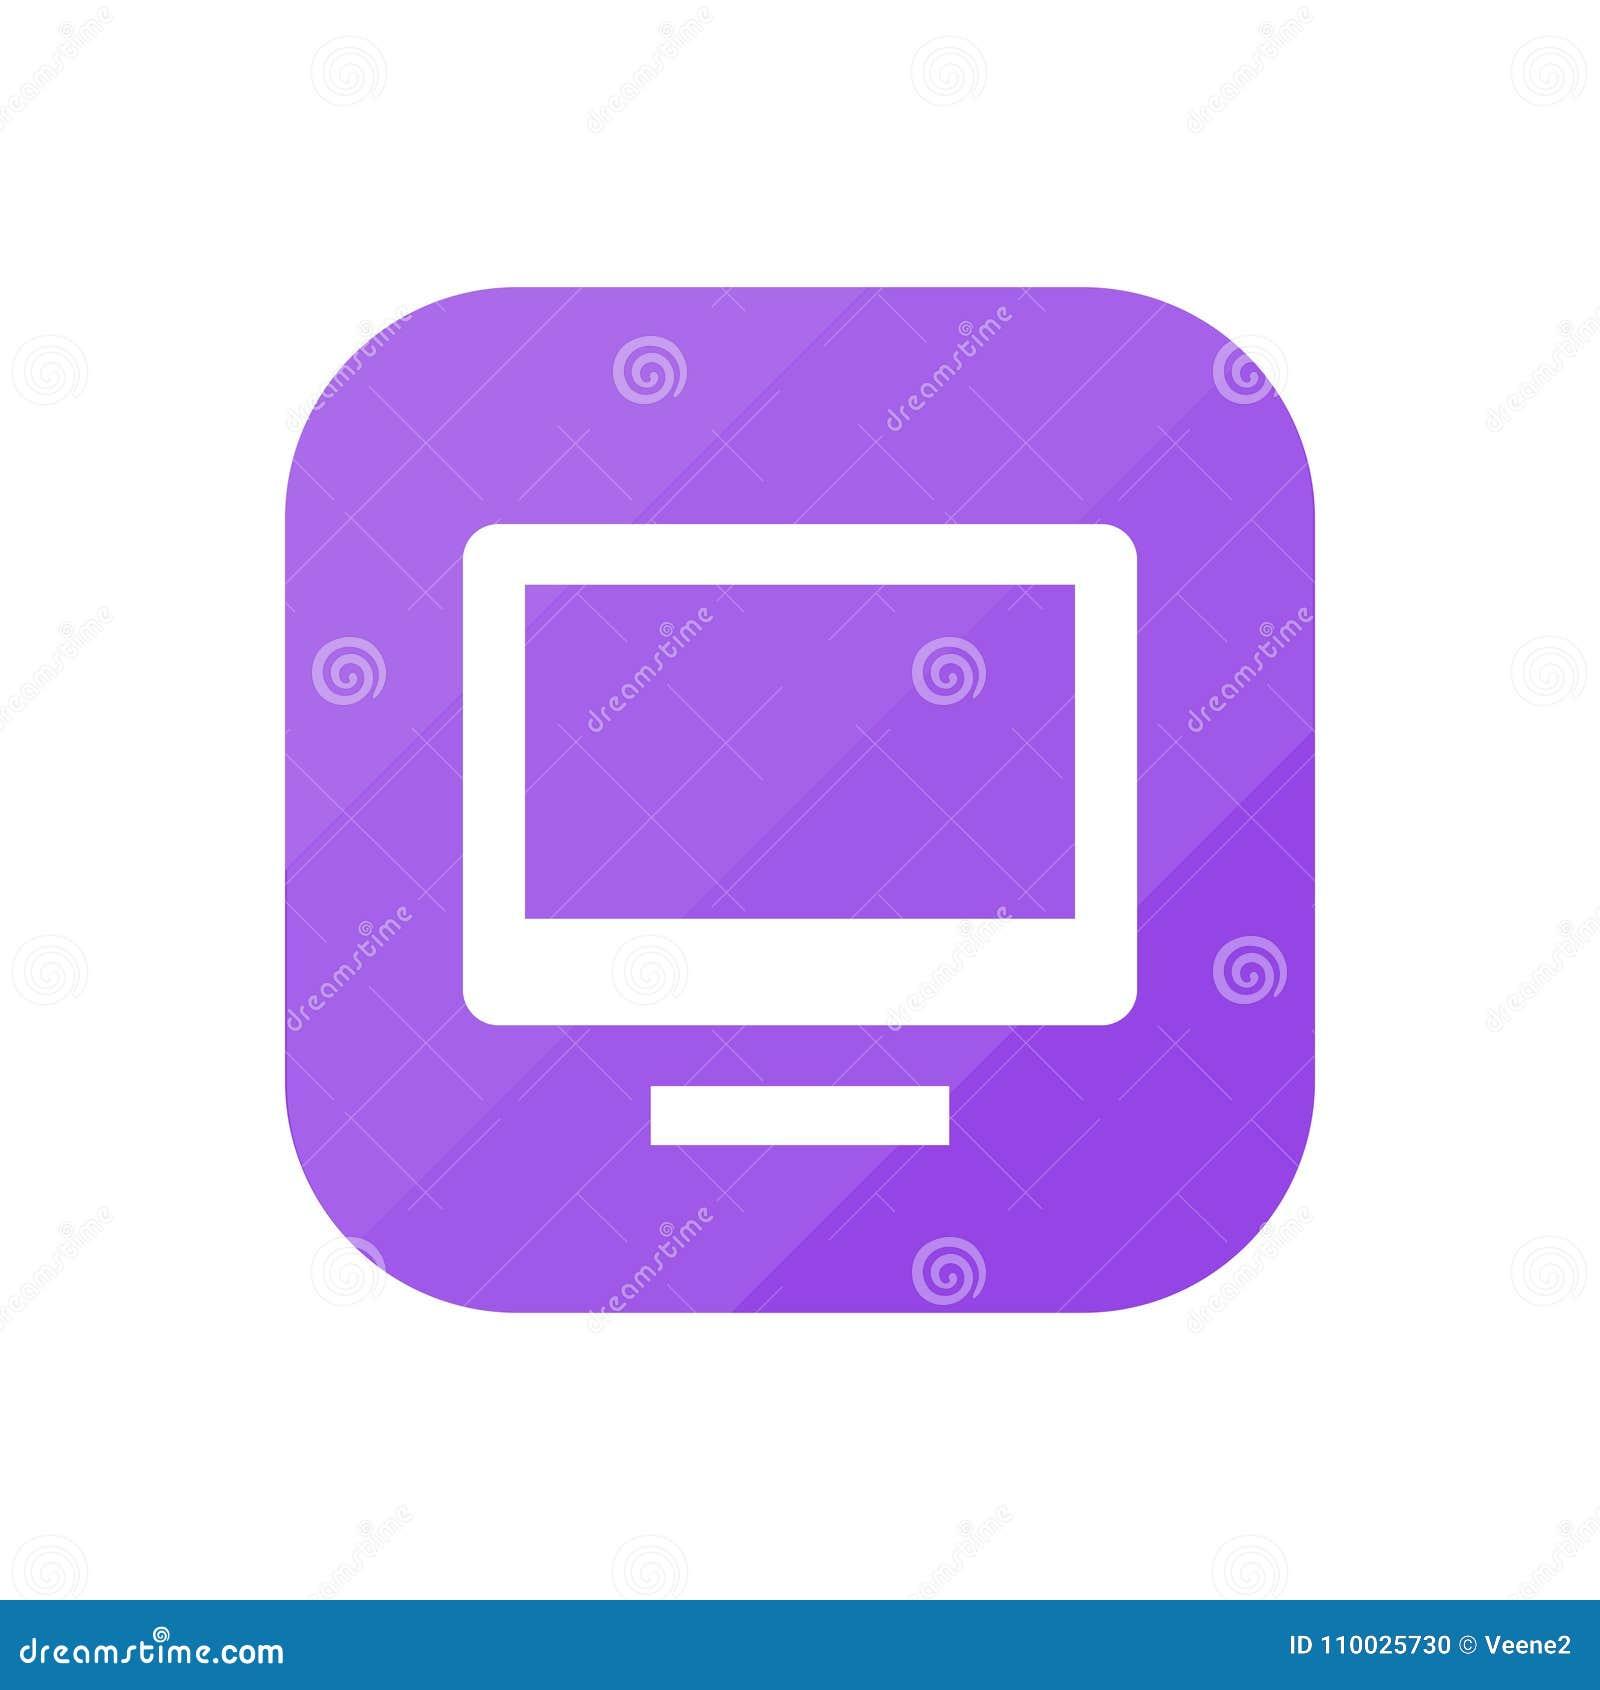 Monitor - App Pictogram